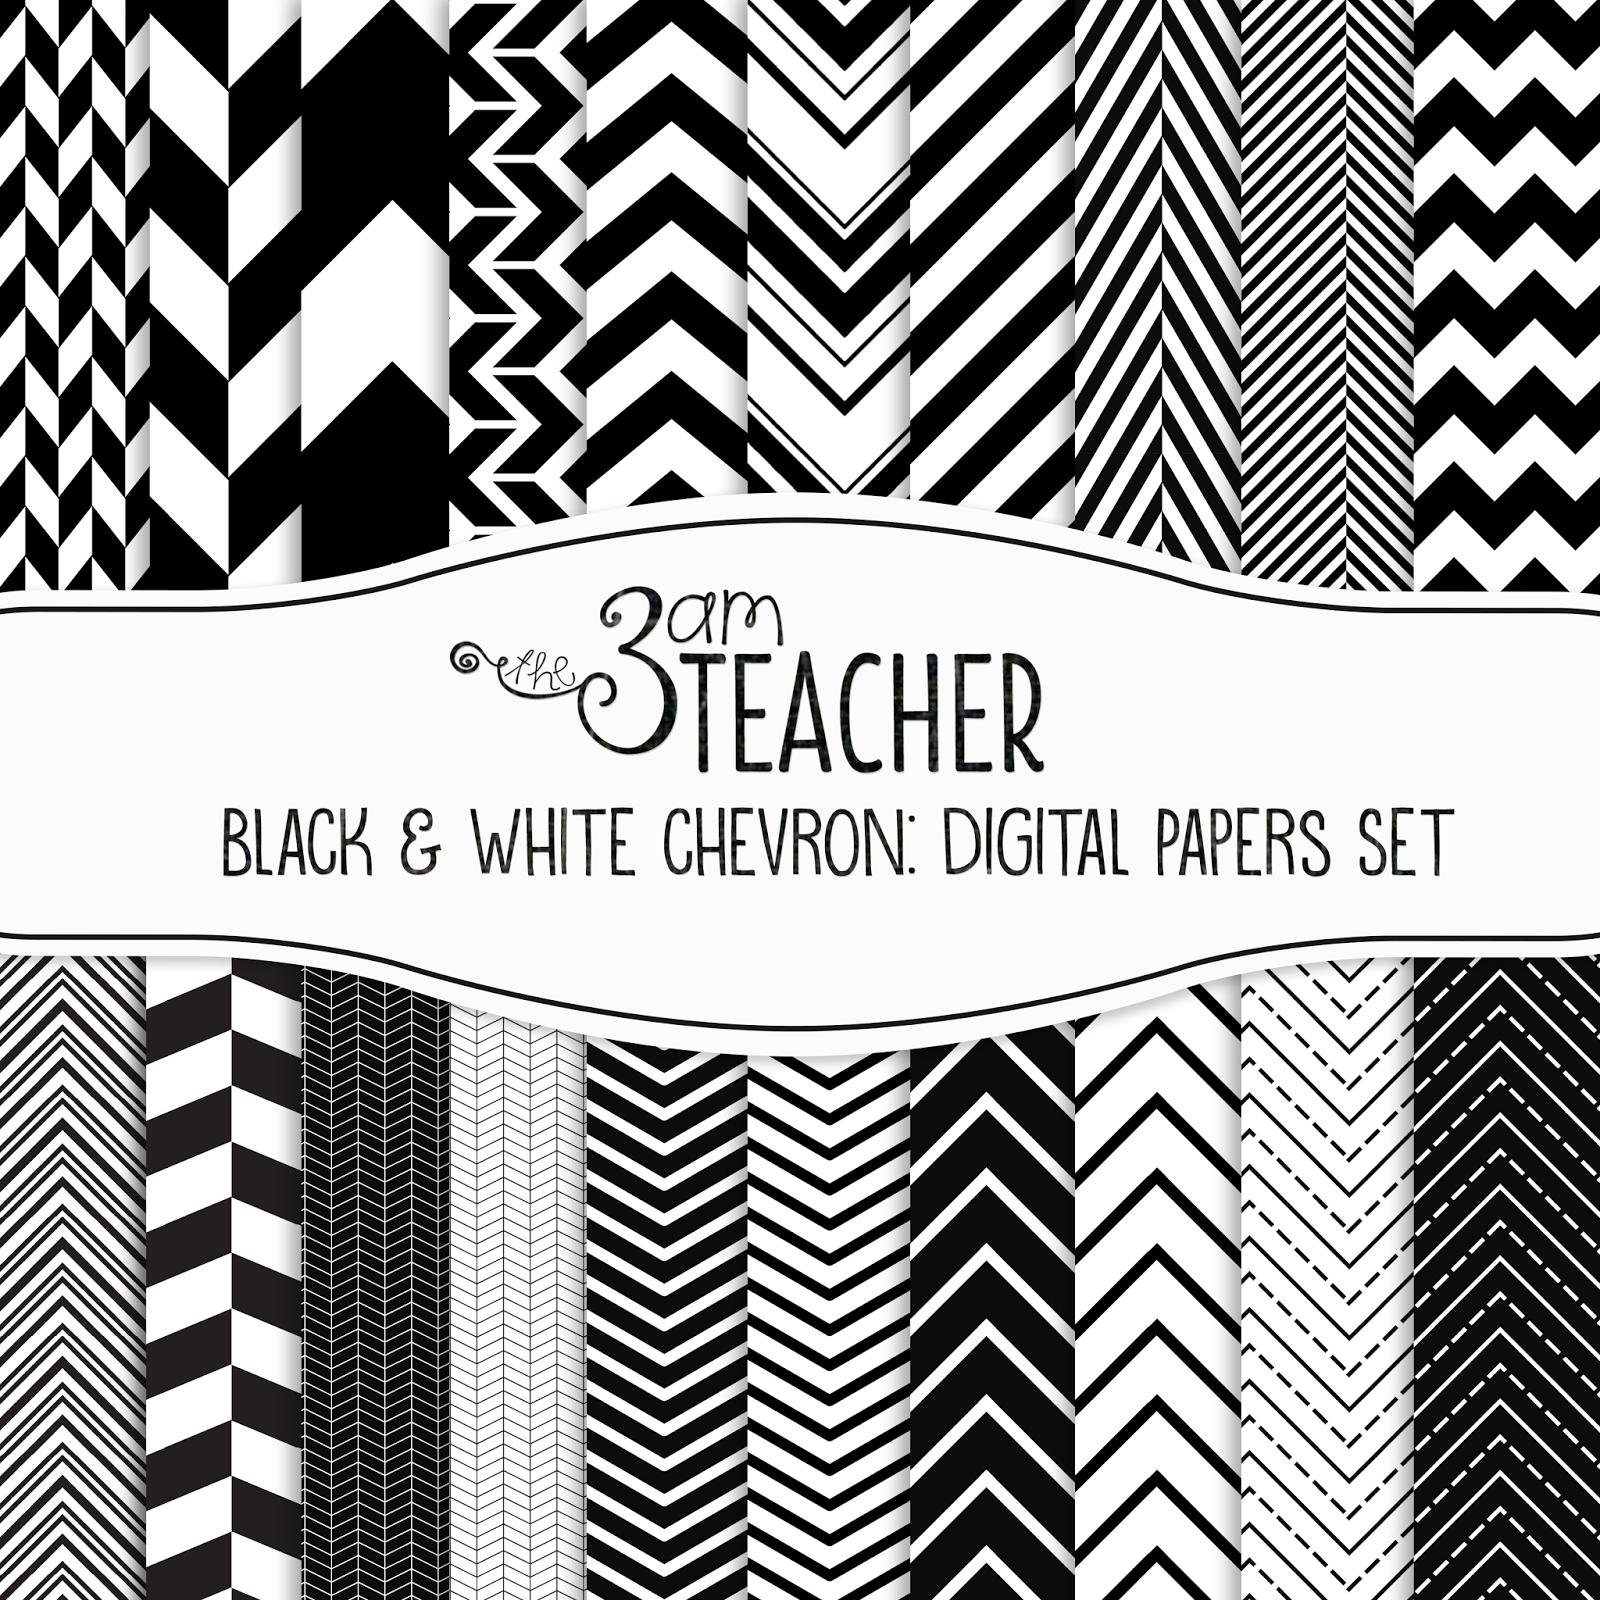 School Binder Covers Templates The Preppy Way Binder Cover